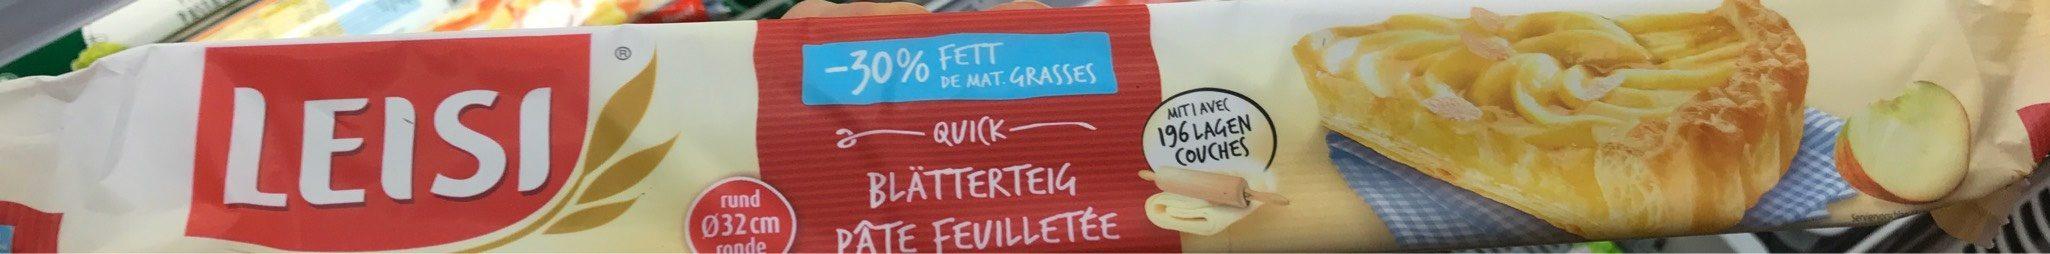 Pâte Feuilletée Rond -30% Mg 230 G - Product - fr